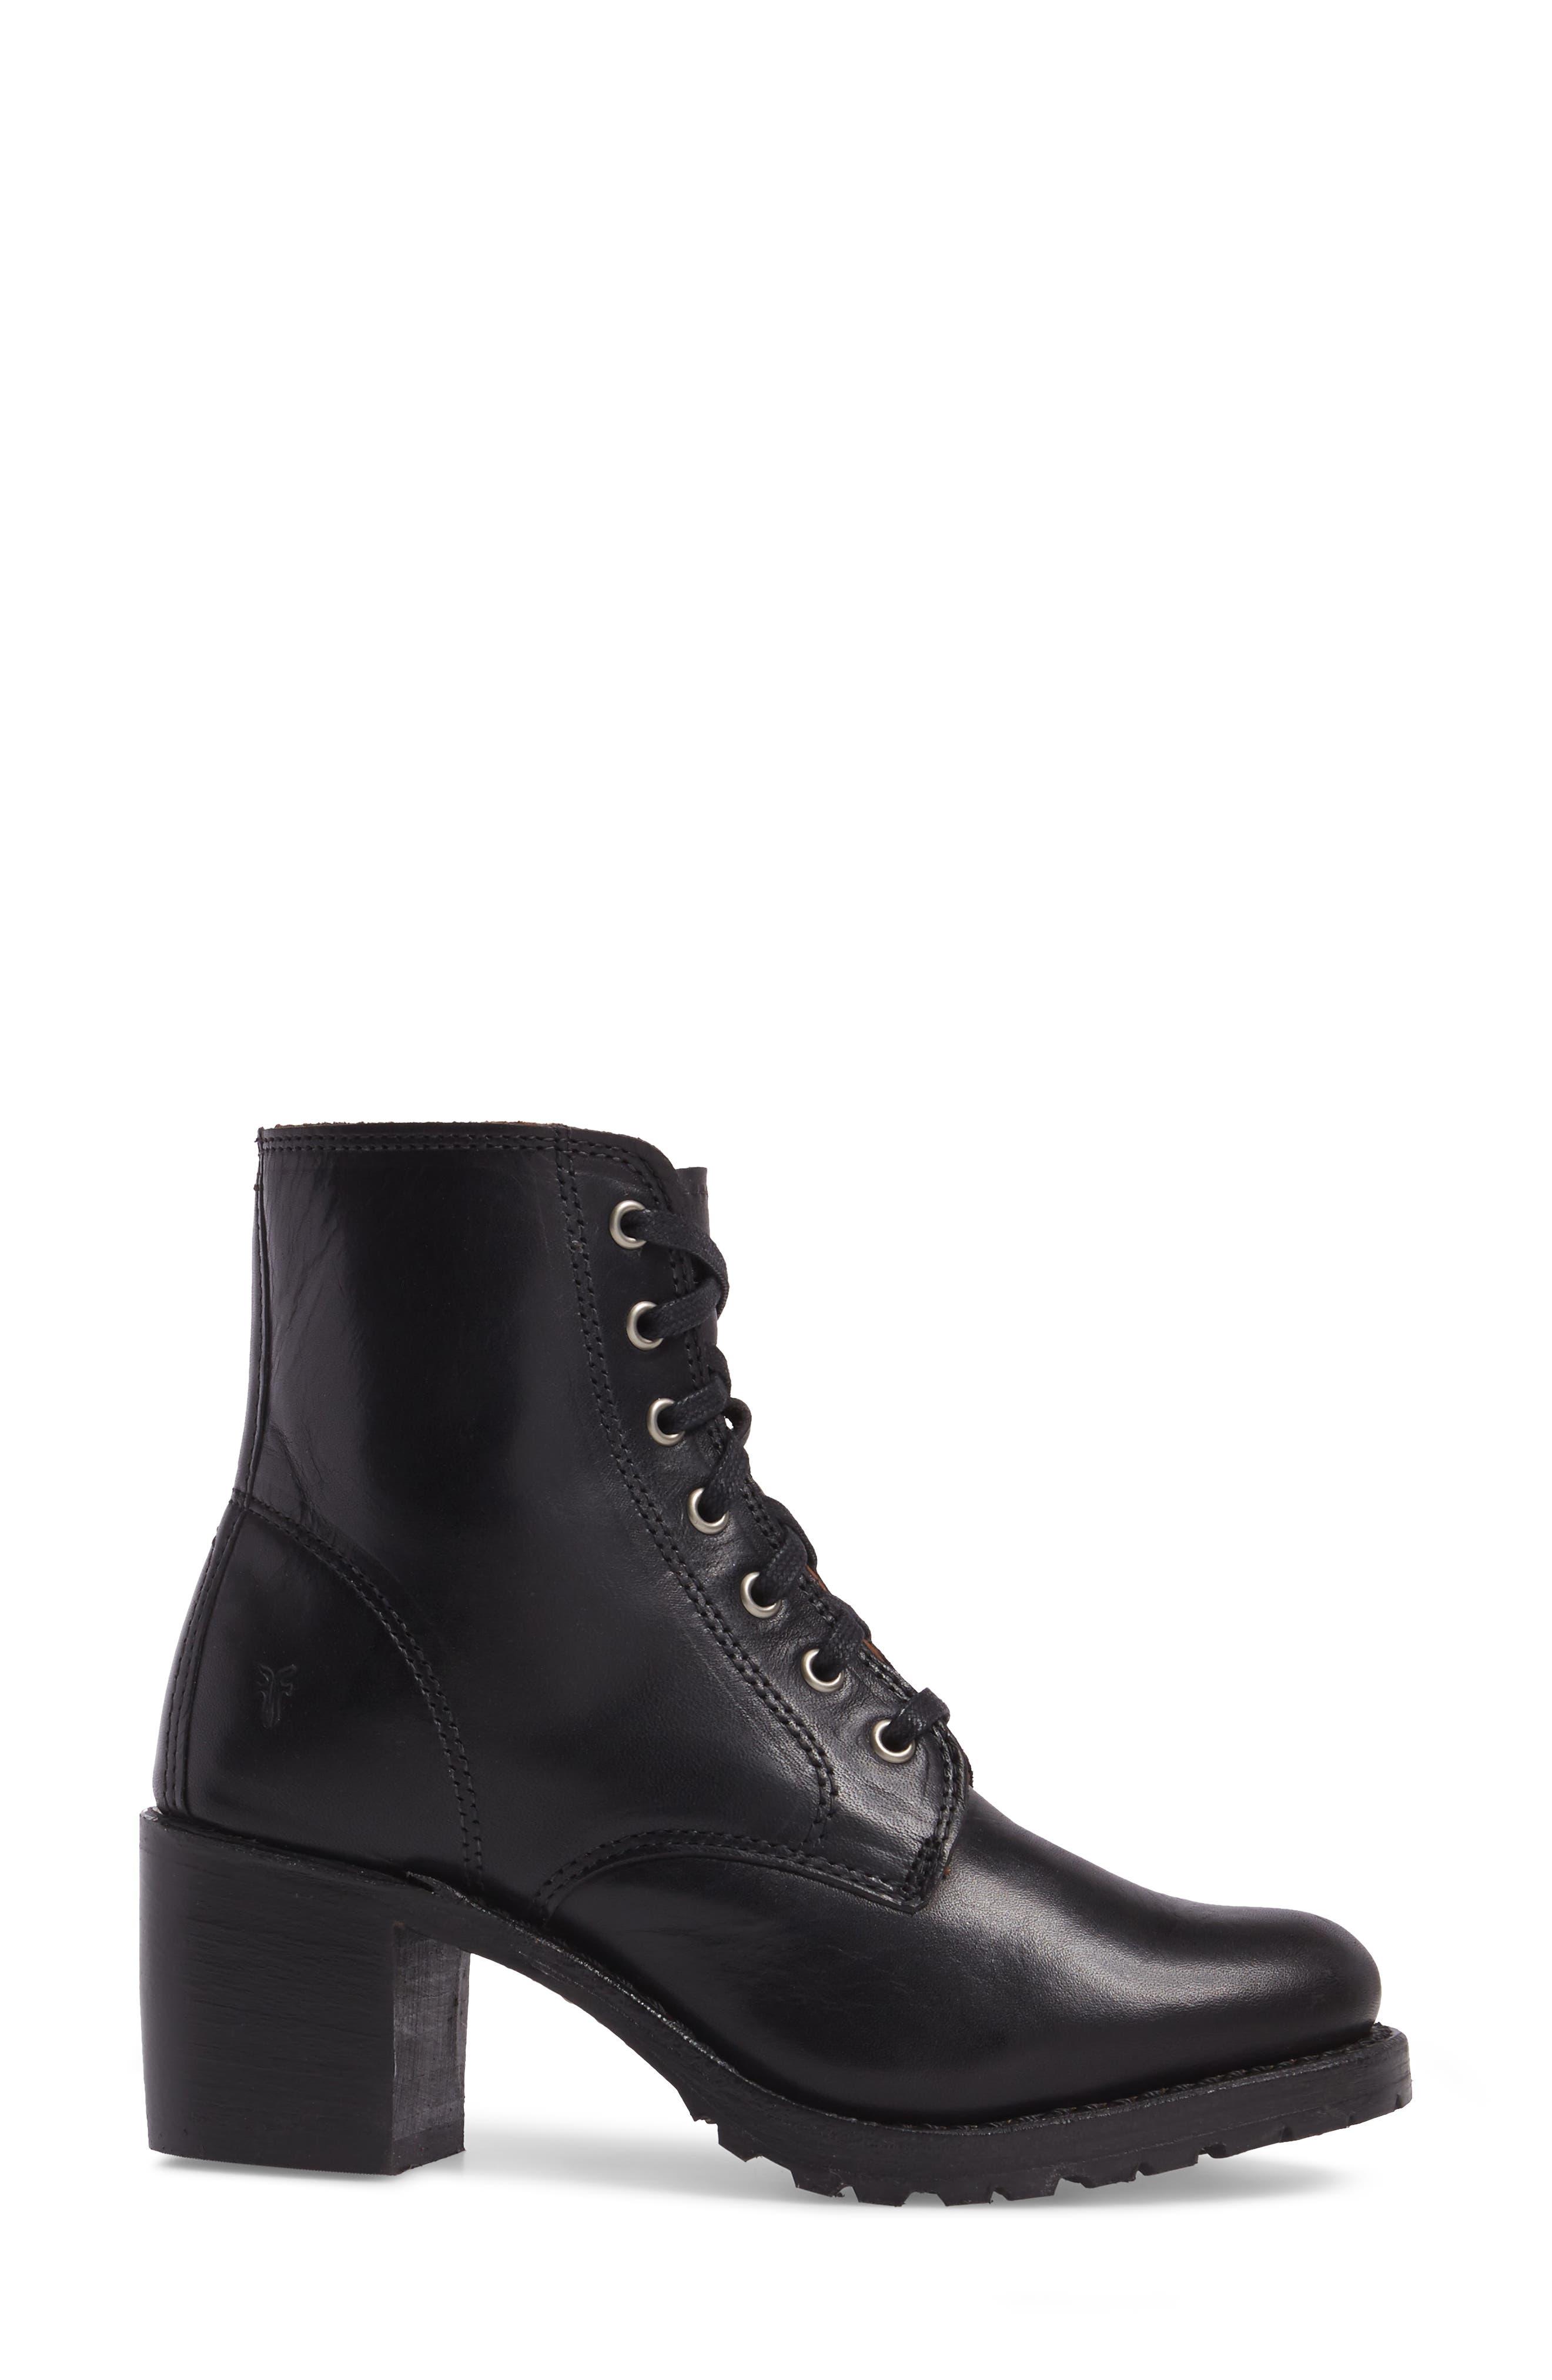 FRYE, Sabrina 6G Lace-Up Boot, Alternate thumbnail 3, color, BLACK